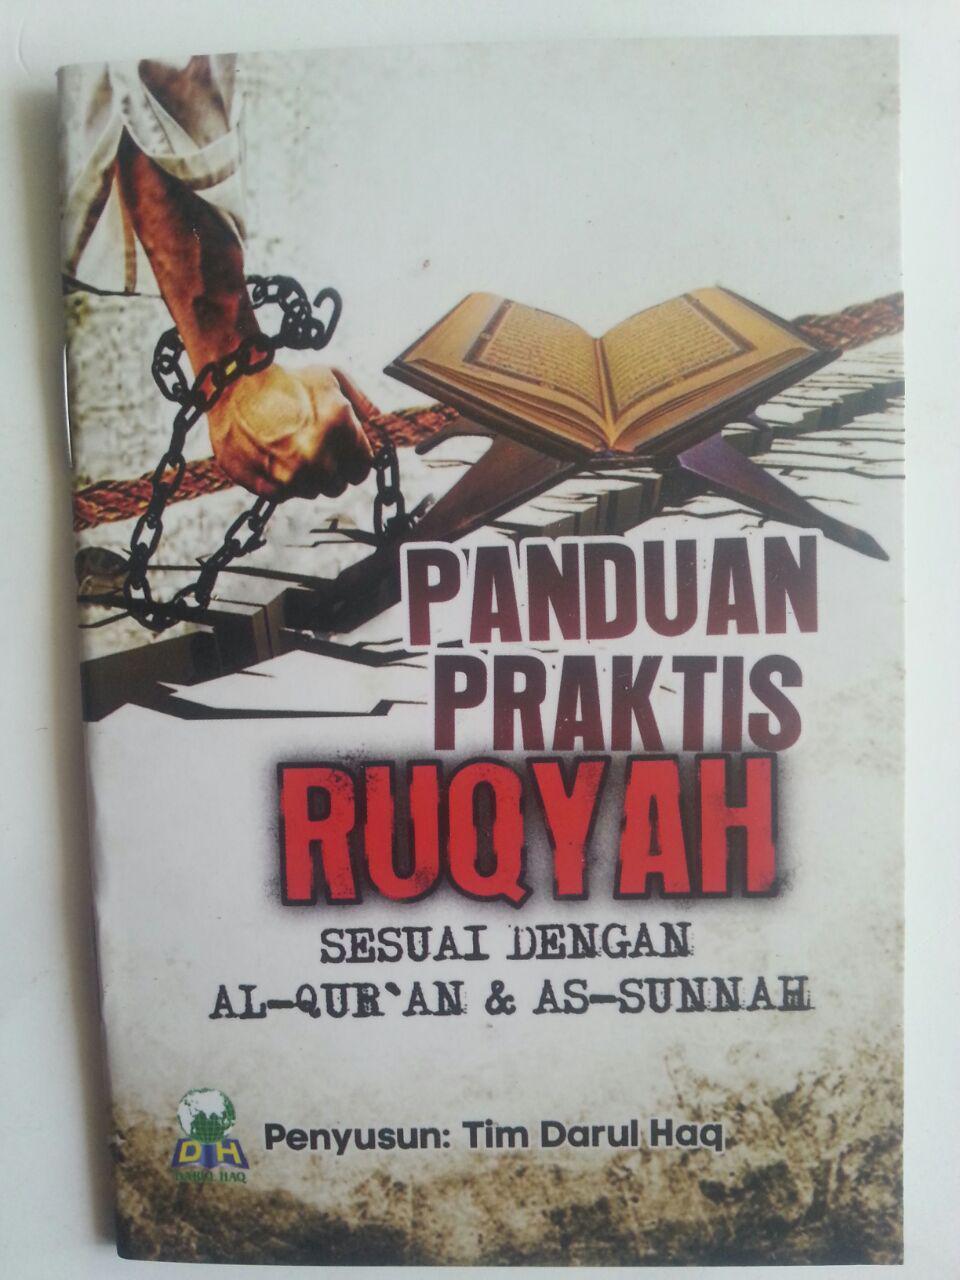 Buku Saku Panduan Praktis Ruqyah Sesuai Al-Quran As-Sunnah isi 4